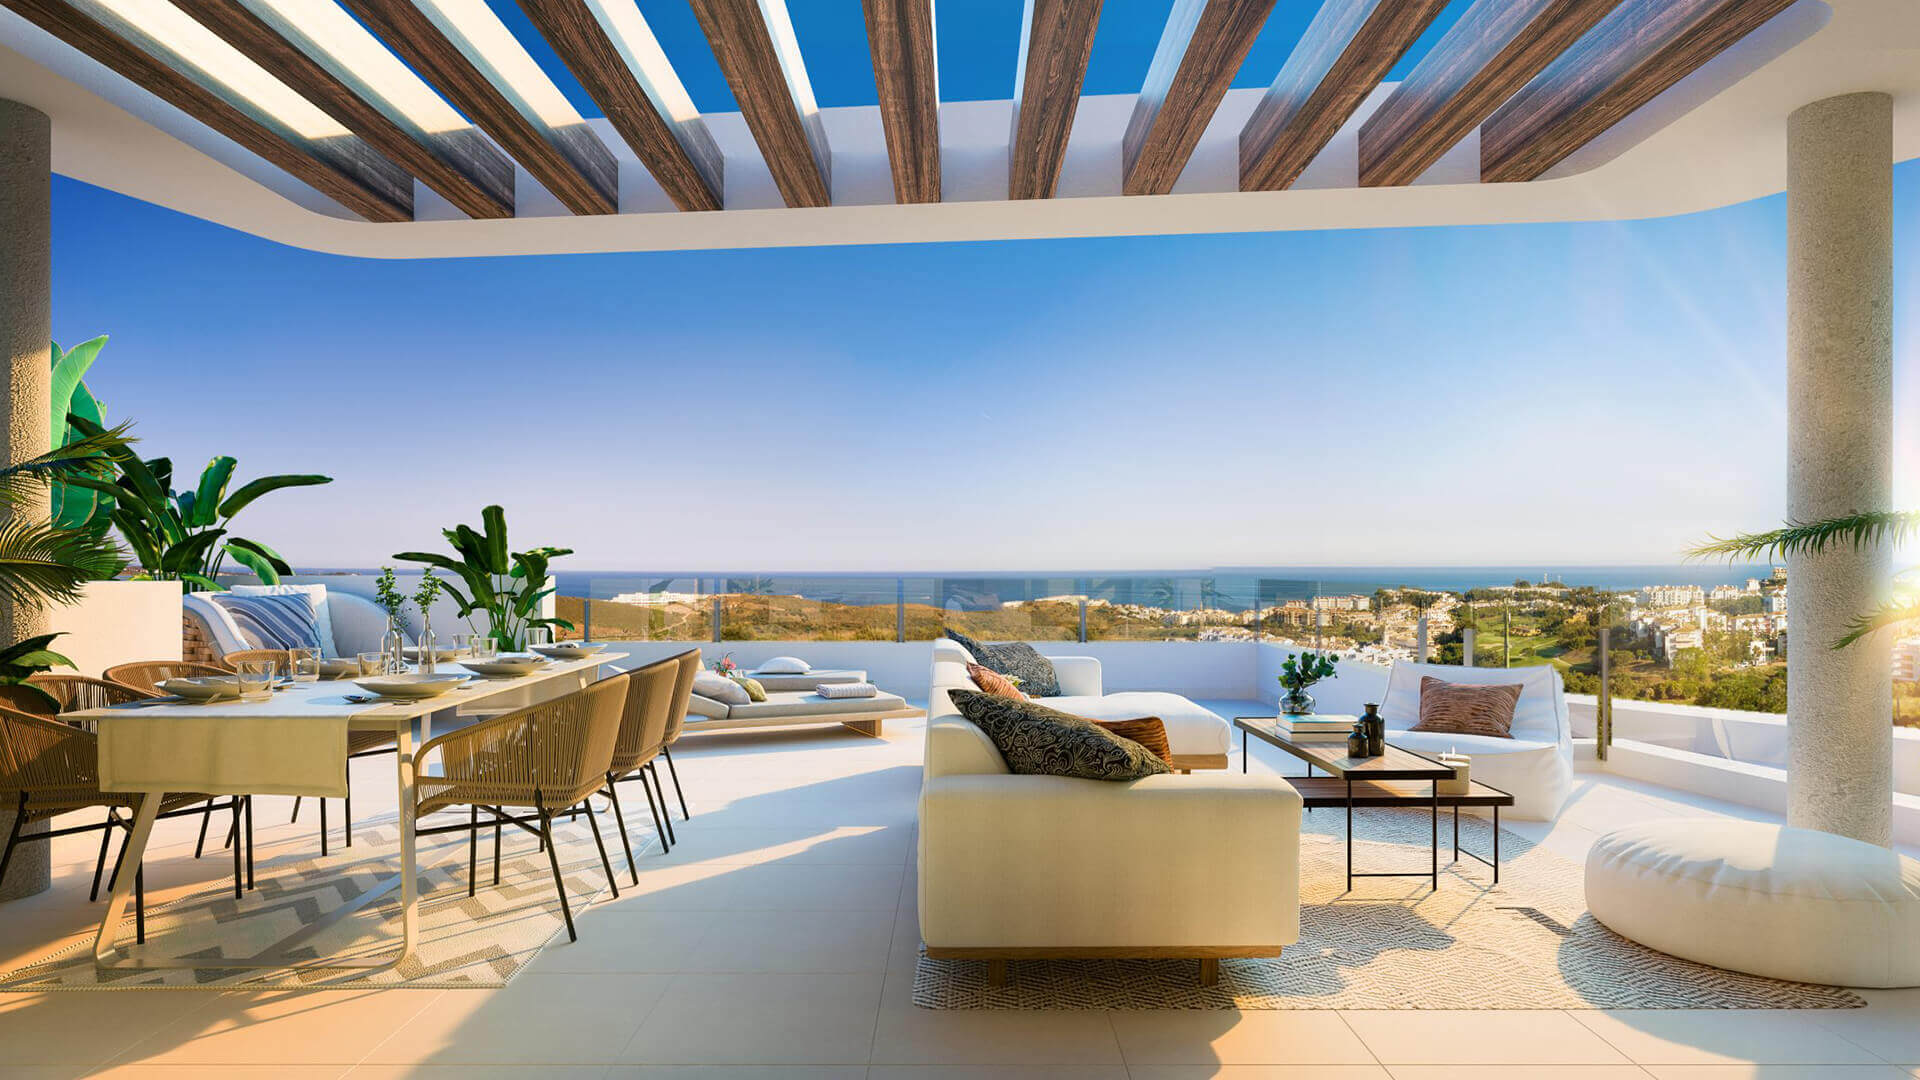 ipanema calanova golf la cala spanje costa del sol nieuwbouw appartement zeezicht penthouse